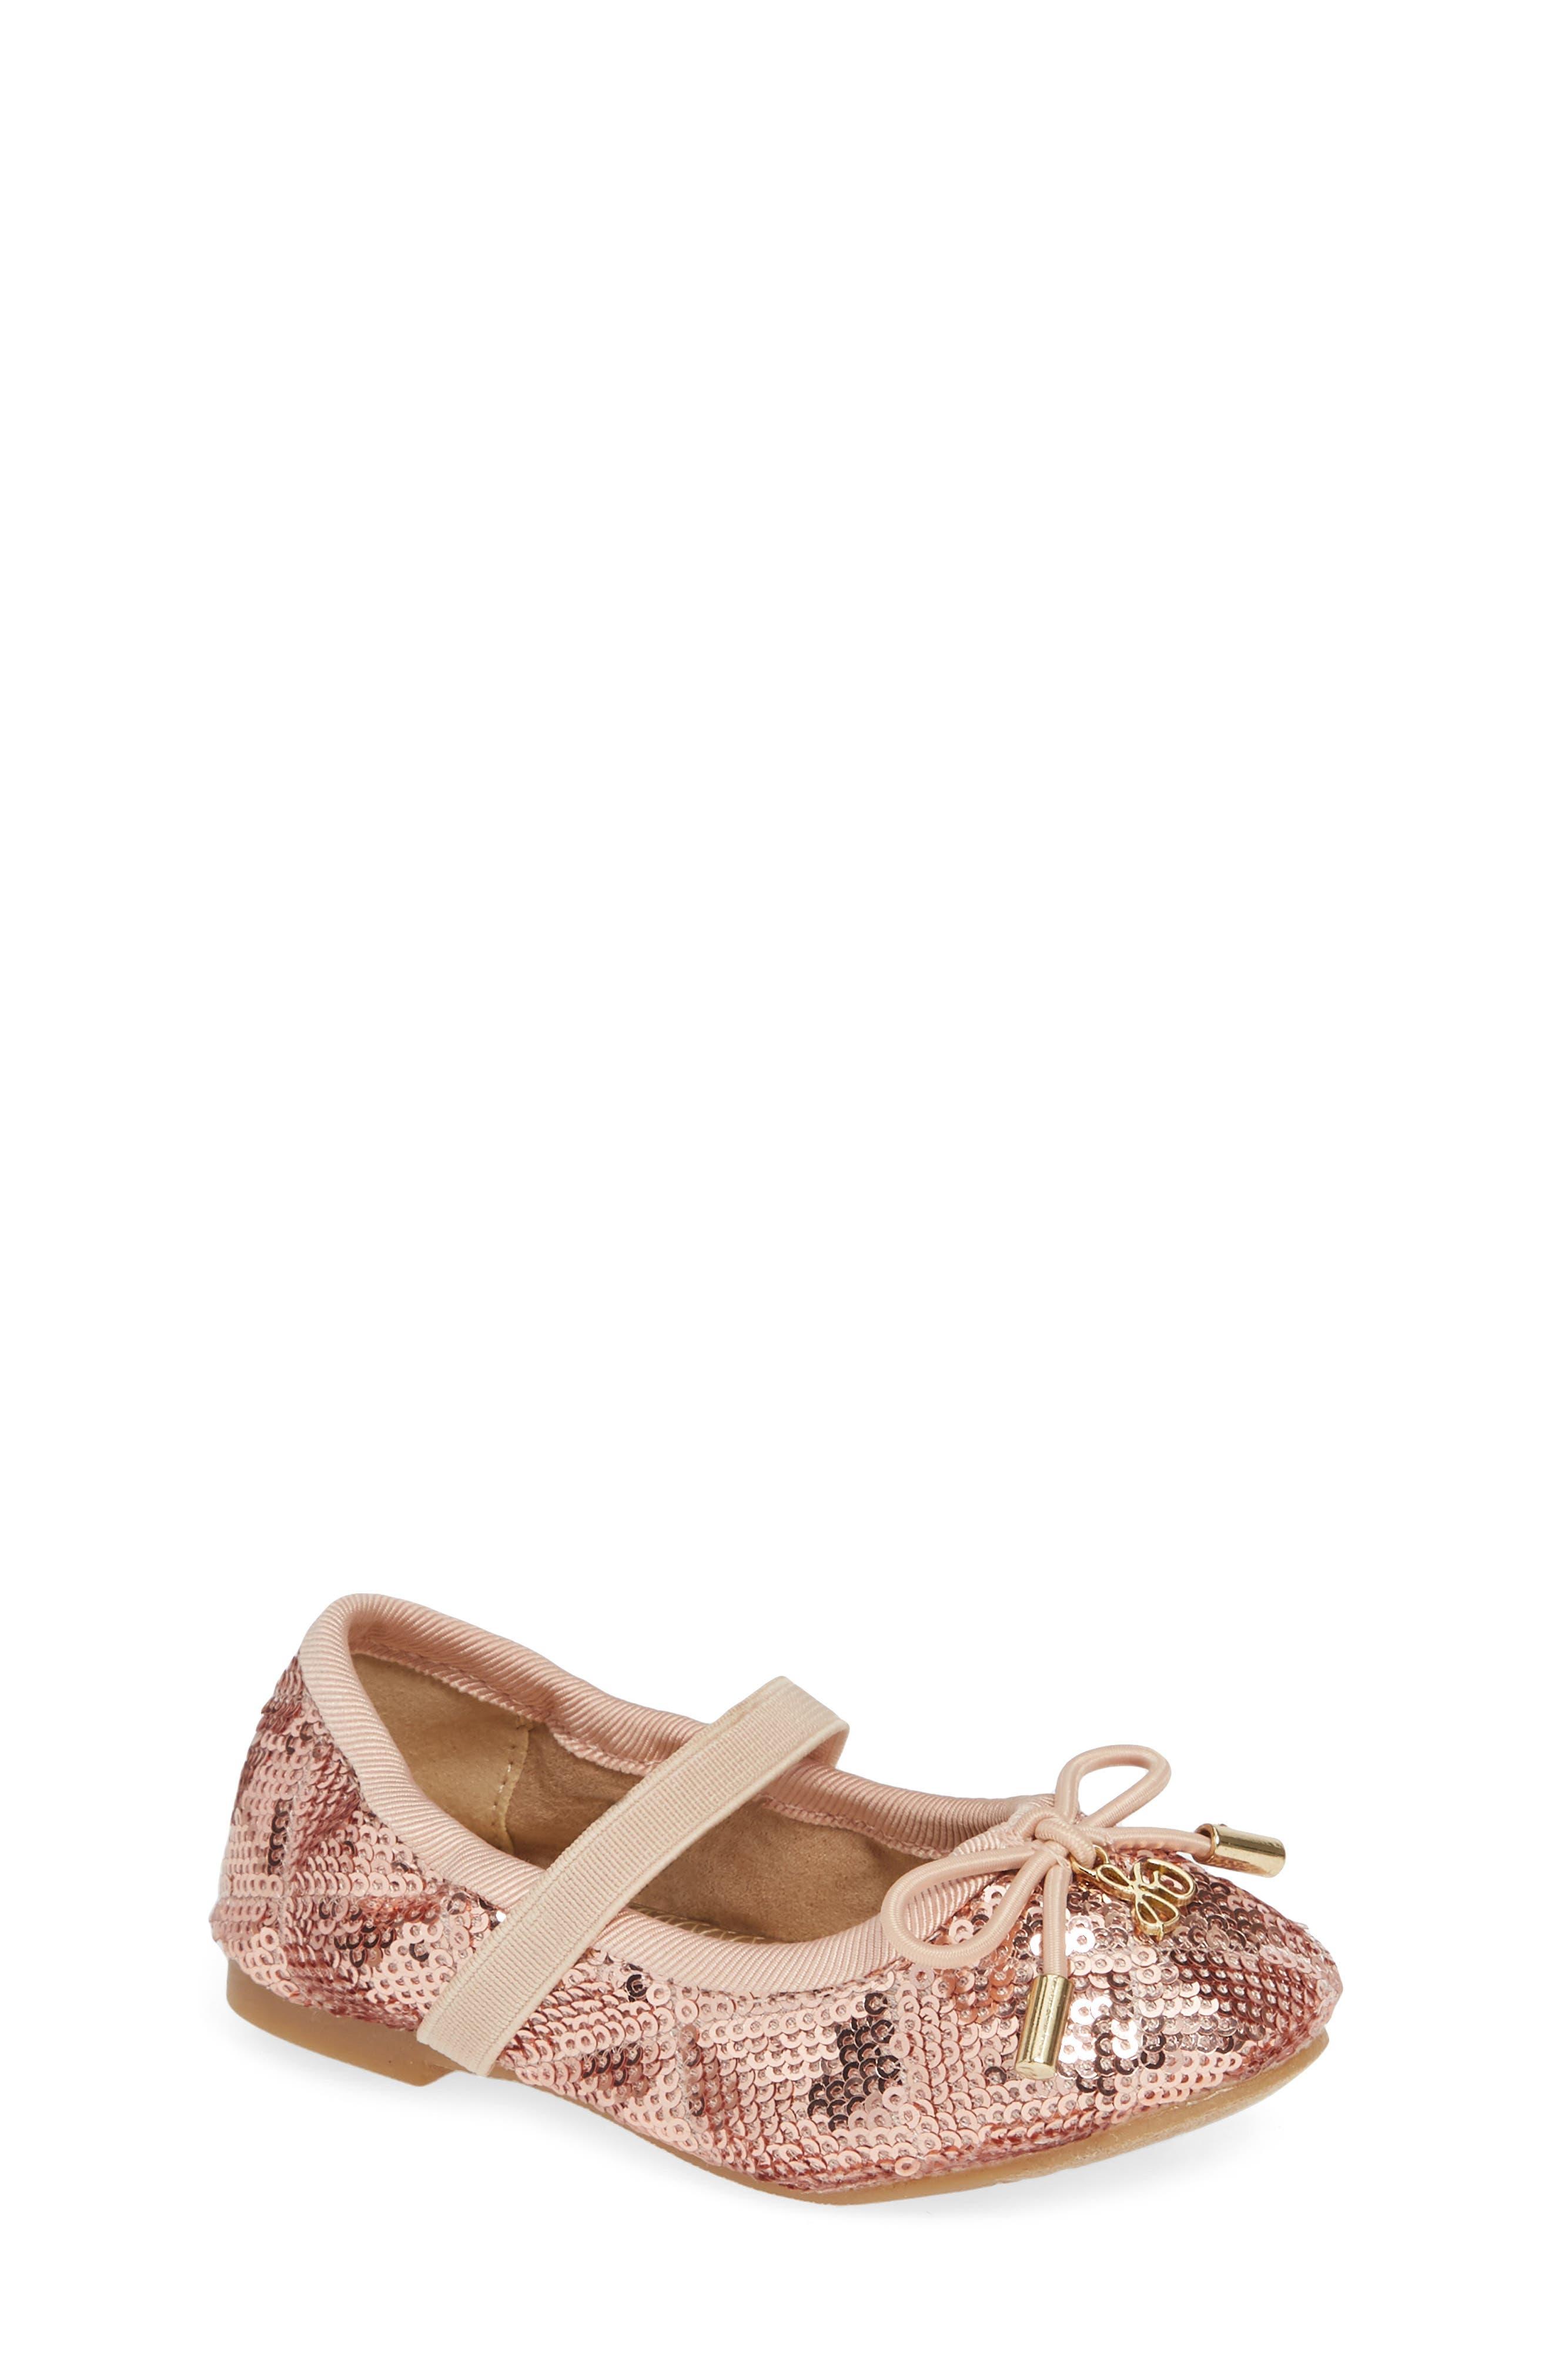 SAM EDELMAN, 'Felicia' Mary Jane Ballet Flat, Main thumbnail 1, color, ROSE GOLD